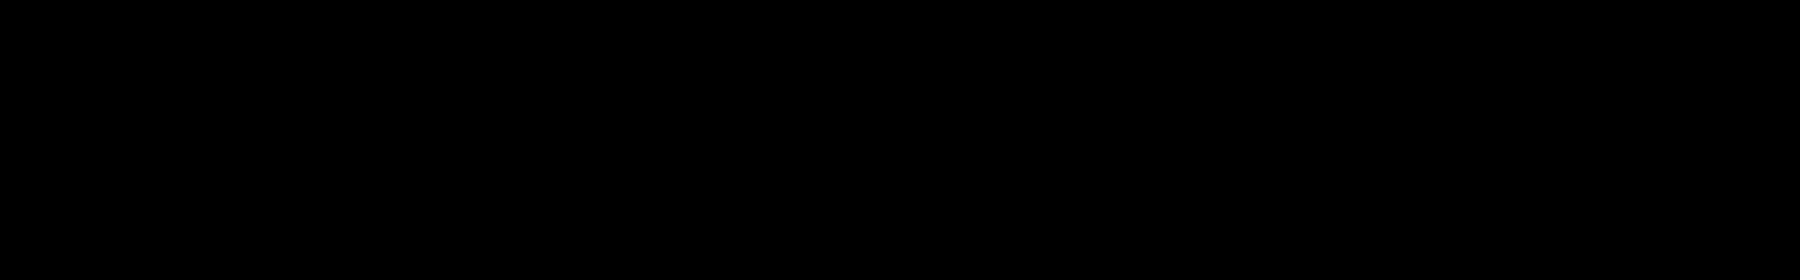 KR-808 audio waveform